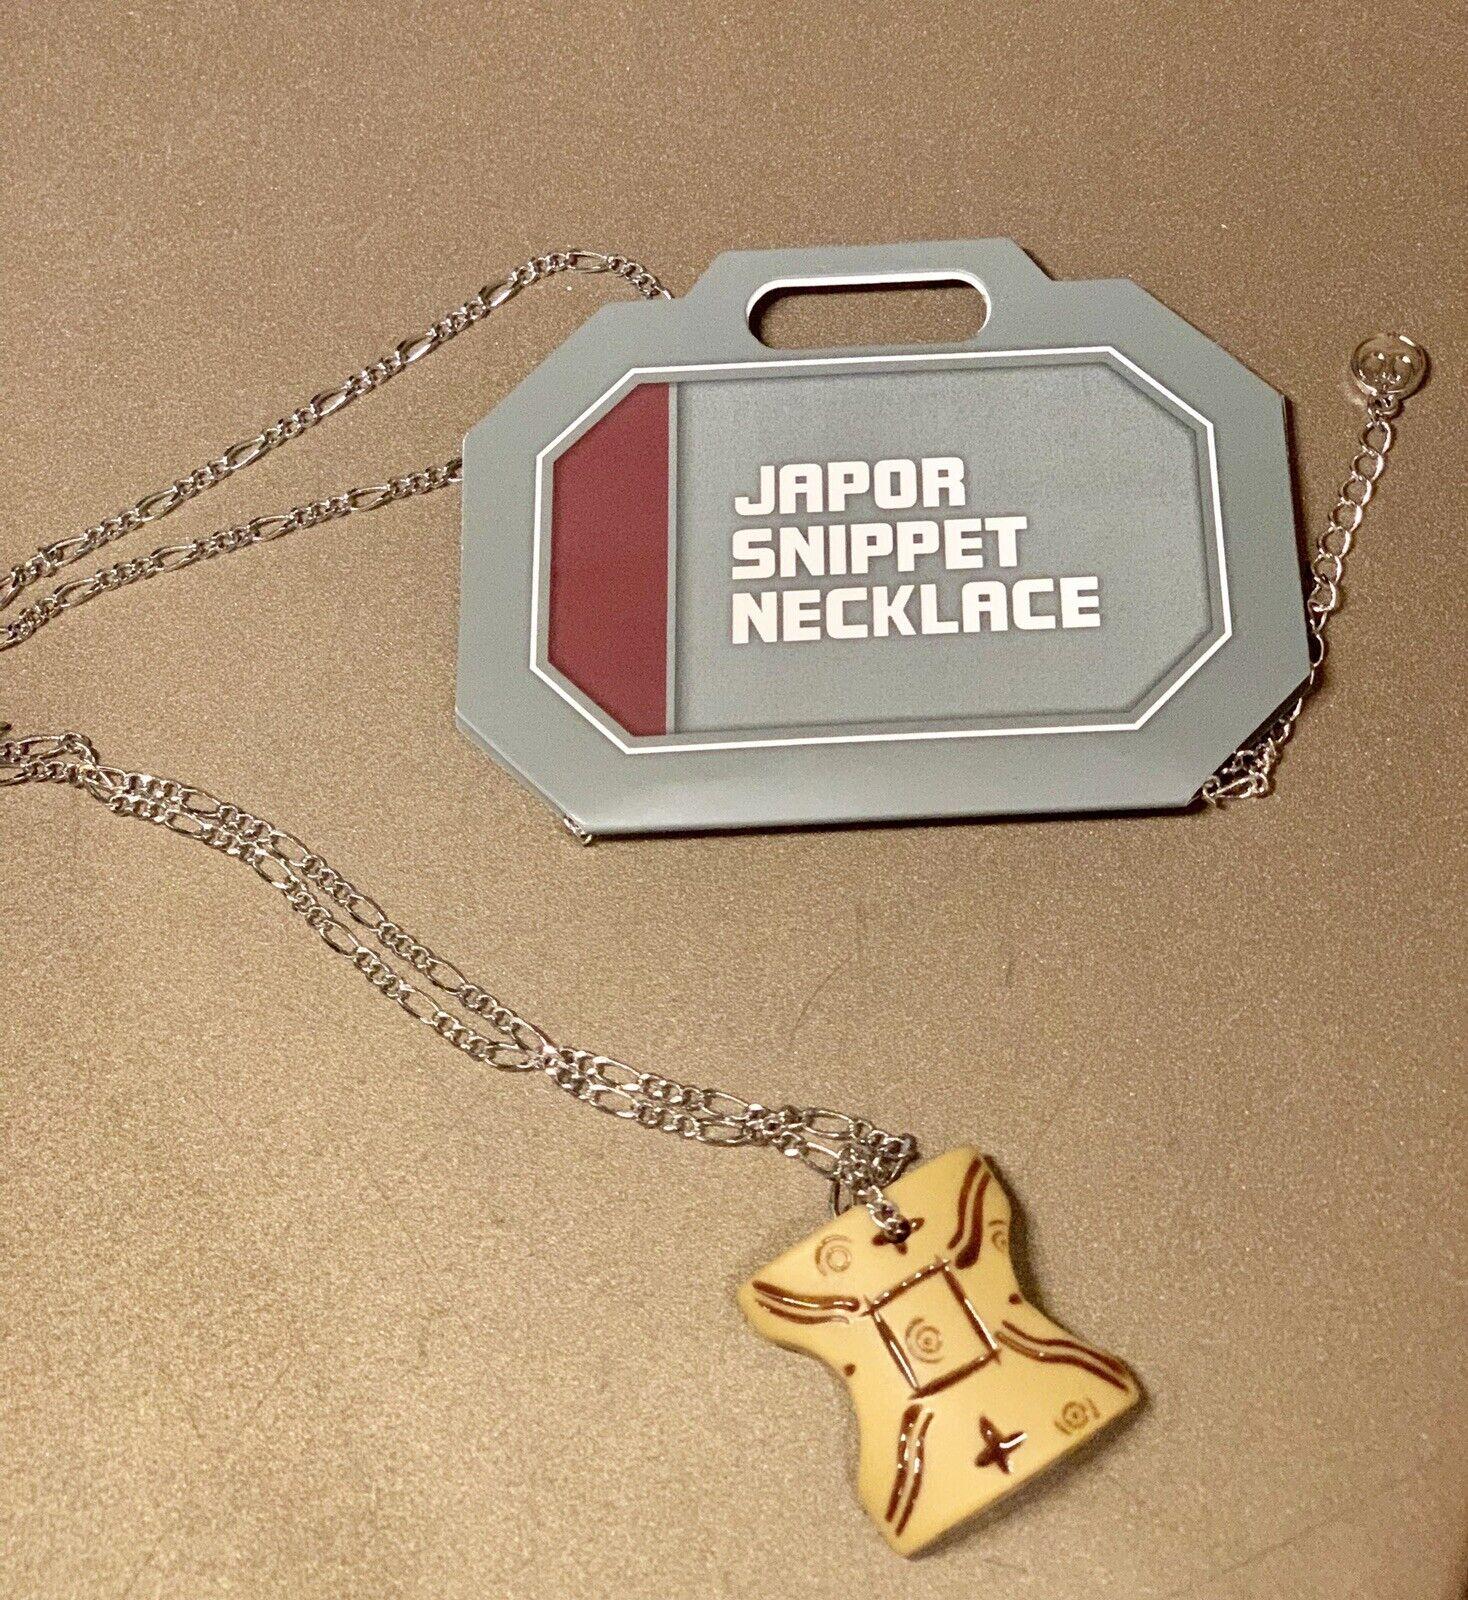 Disney Star Wars Galaxy's Edge Japor snippet Necklace Padme